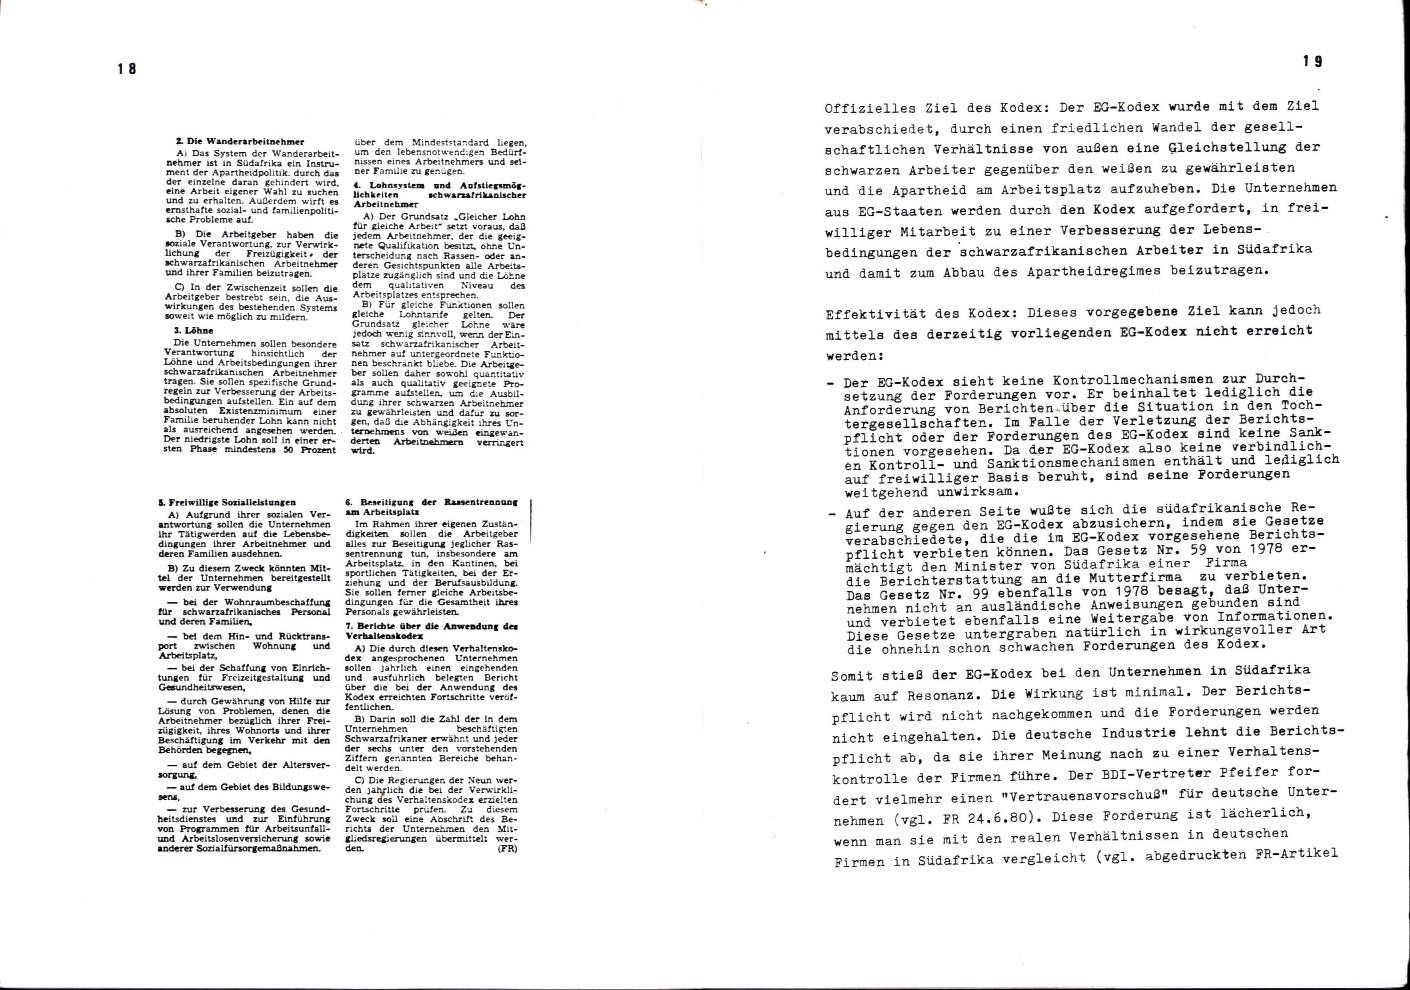 Muenster_AKAFRIK_1981_Suedafrika_BRD_11